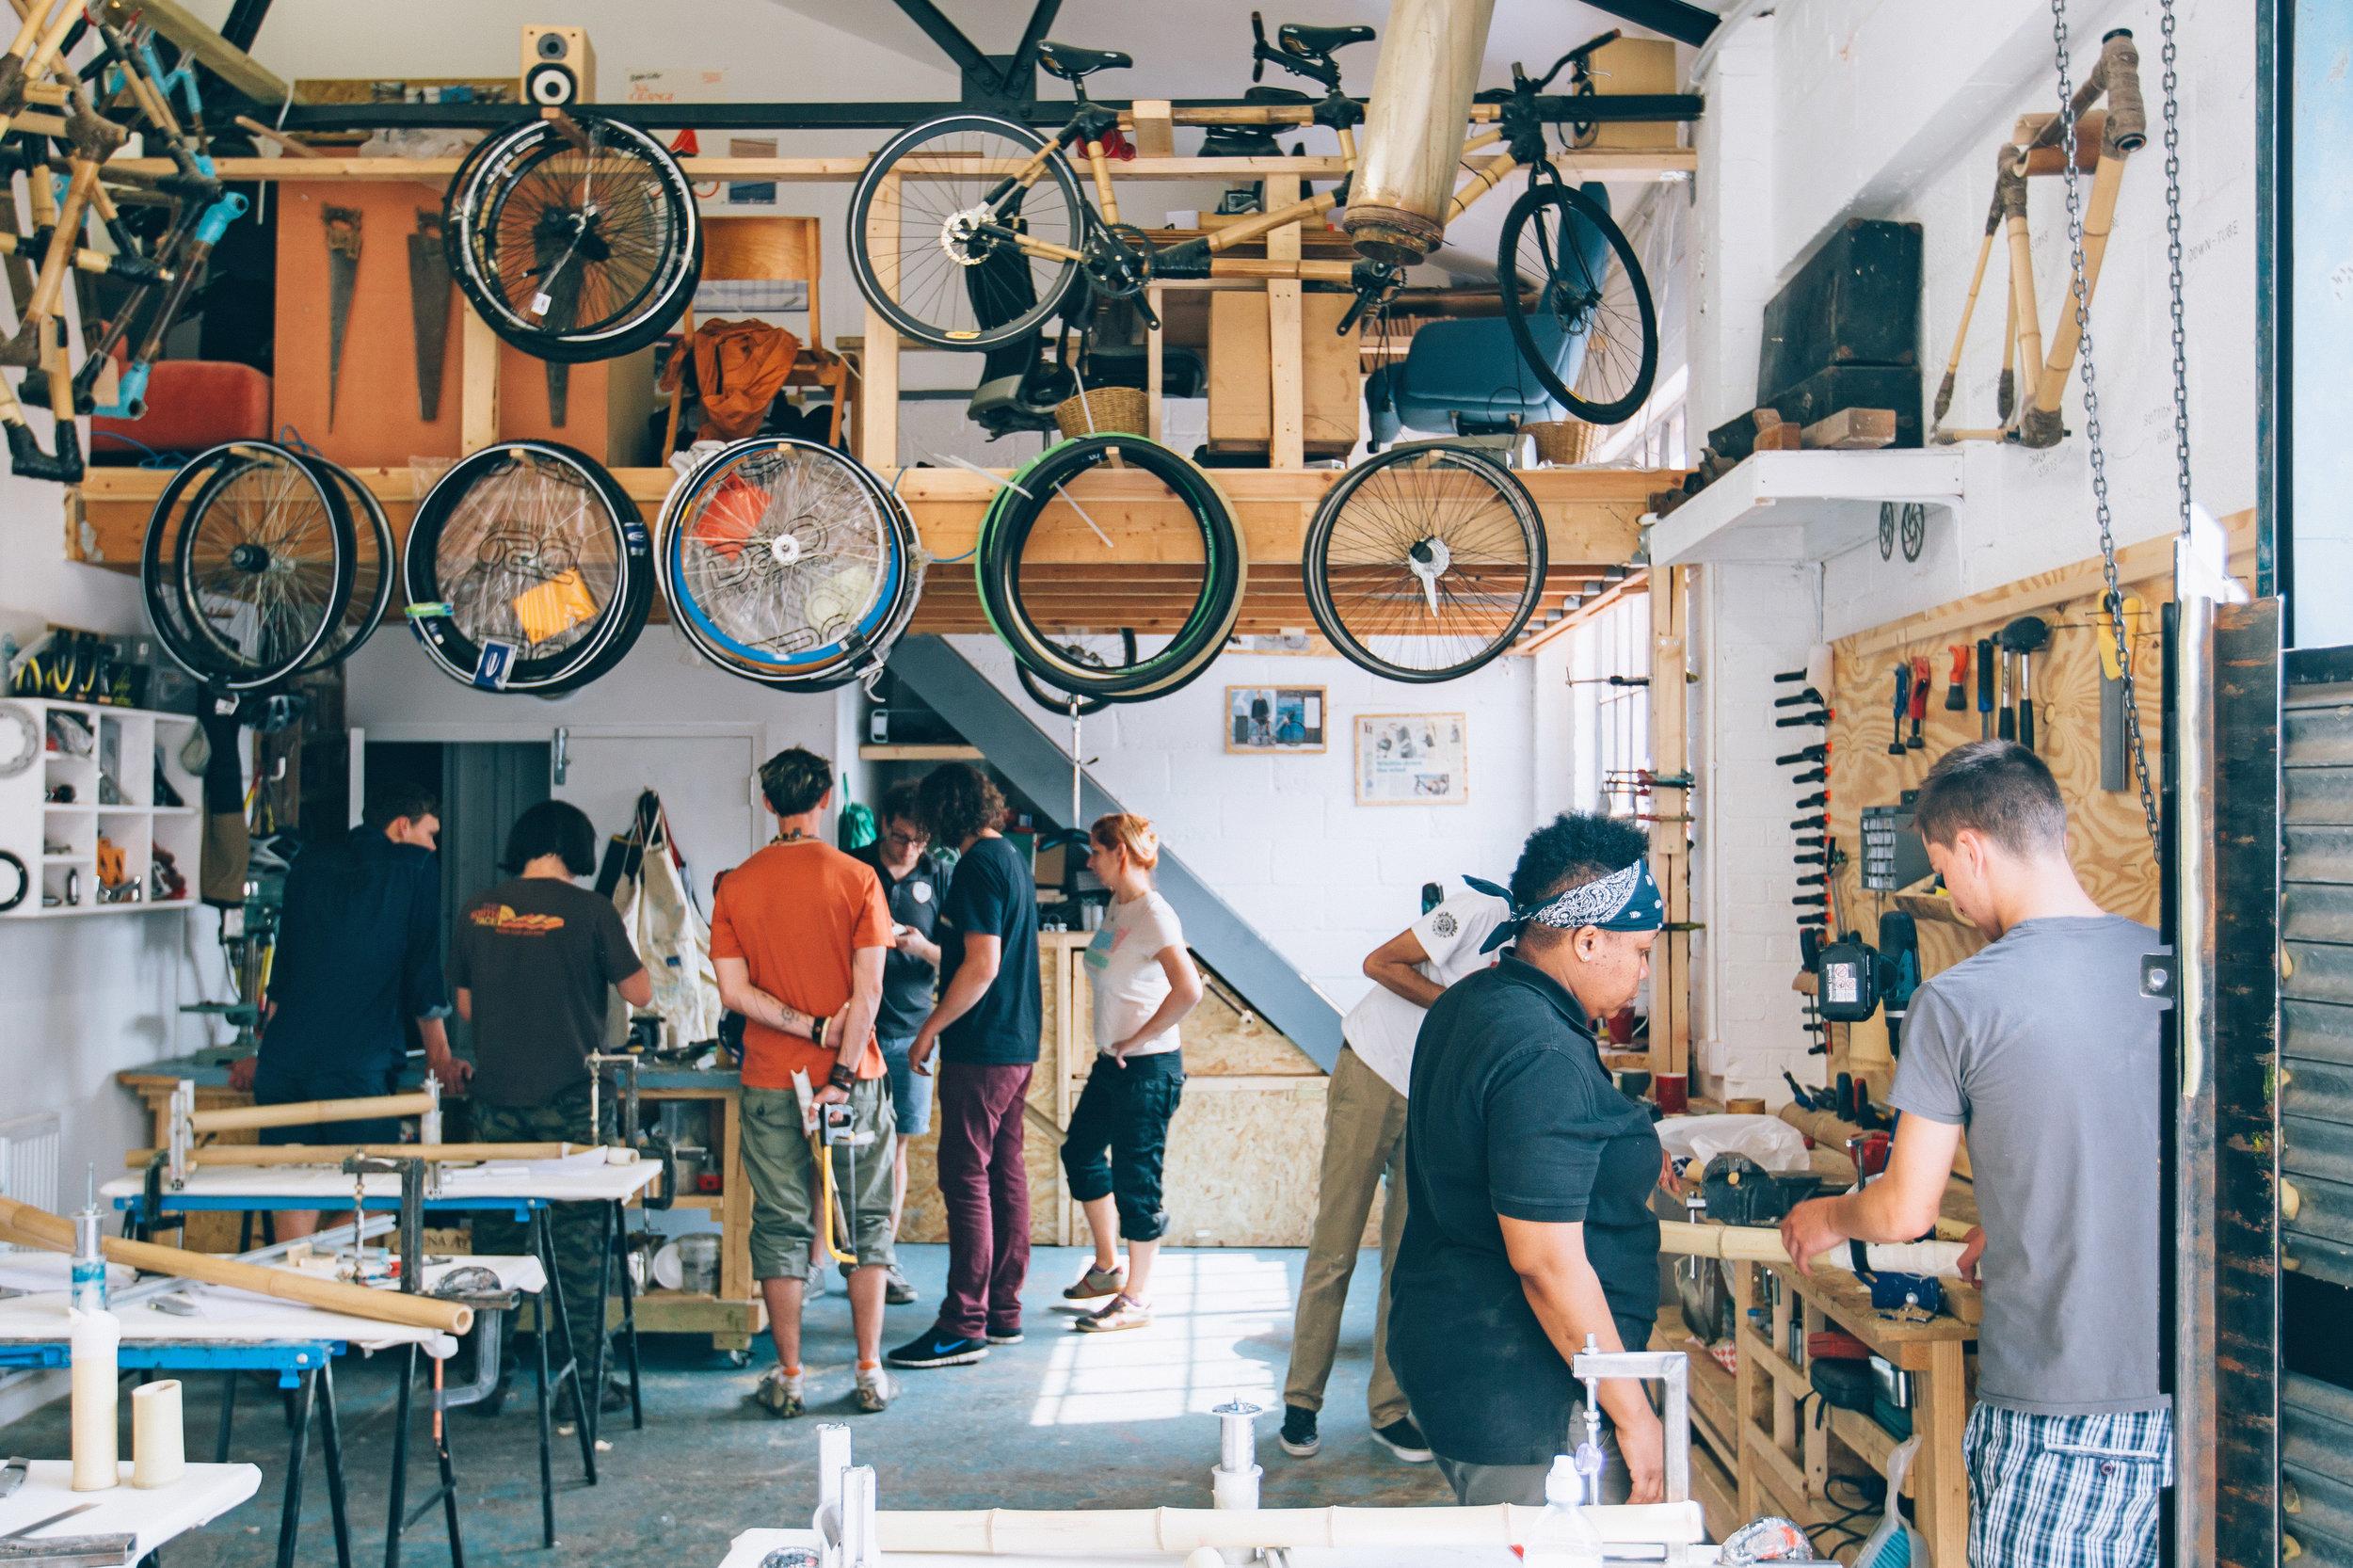 The workshop in Hackney Wick